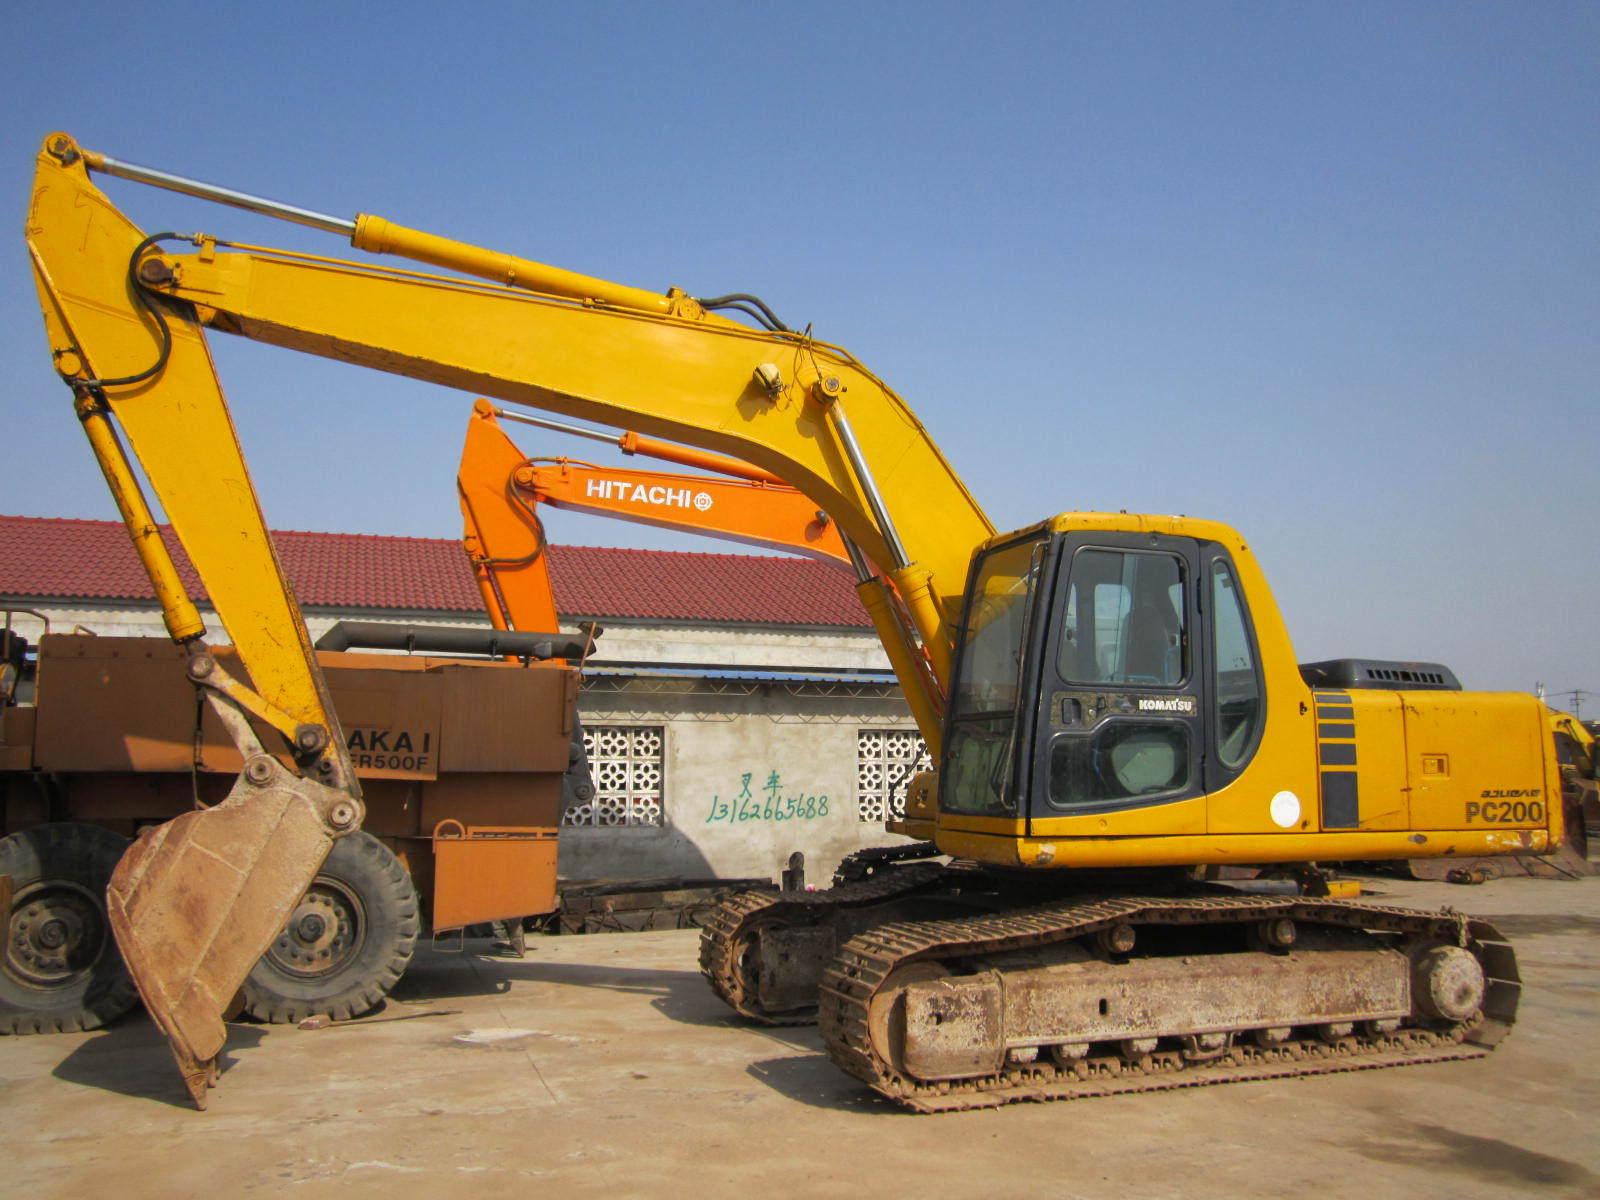 Used Excavator Original Komatsu PC200-6